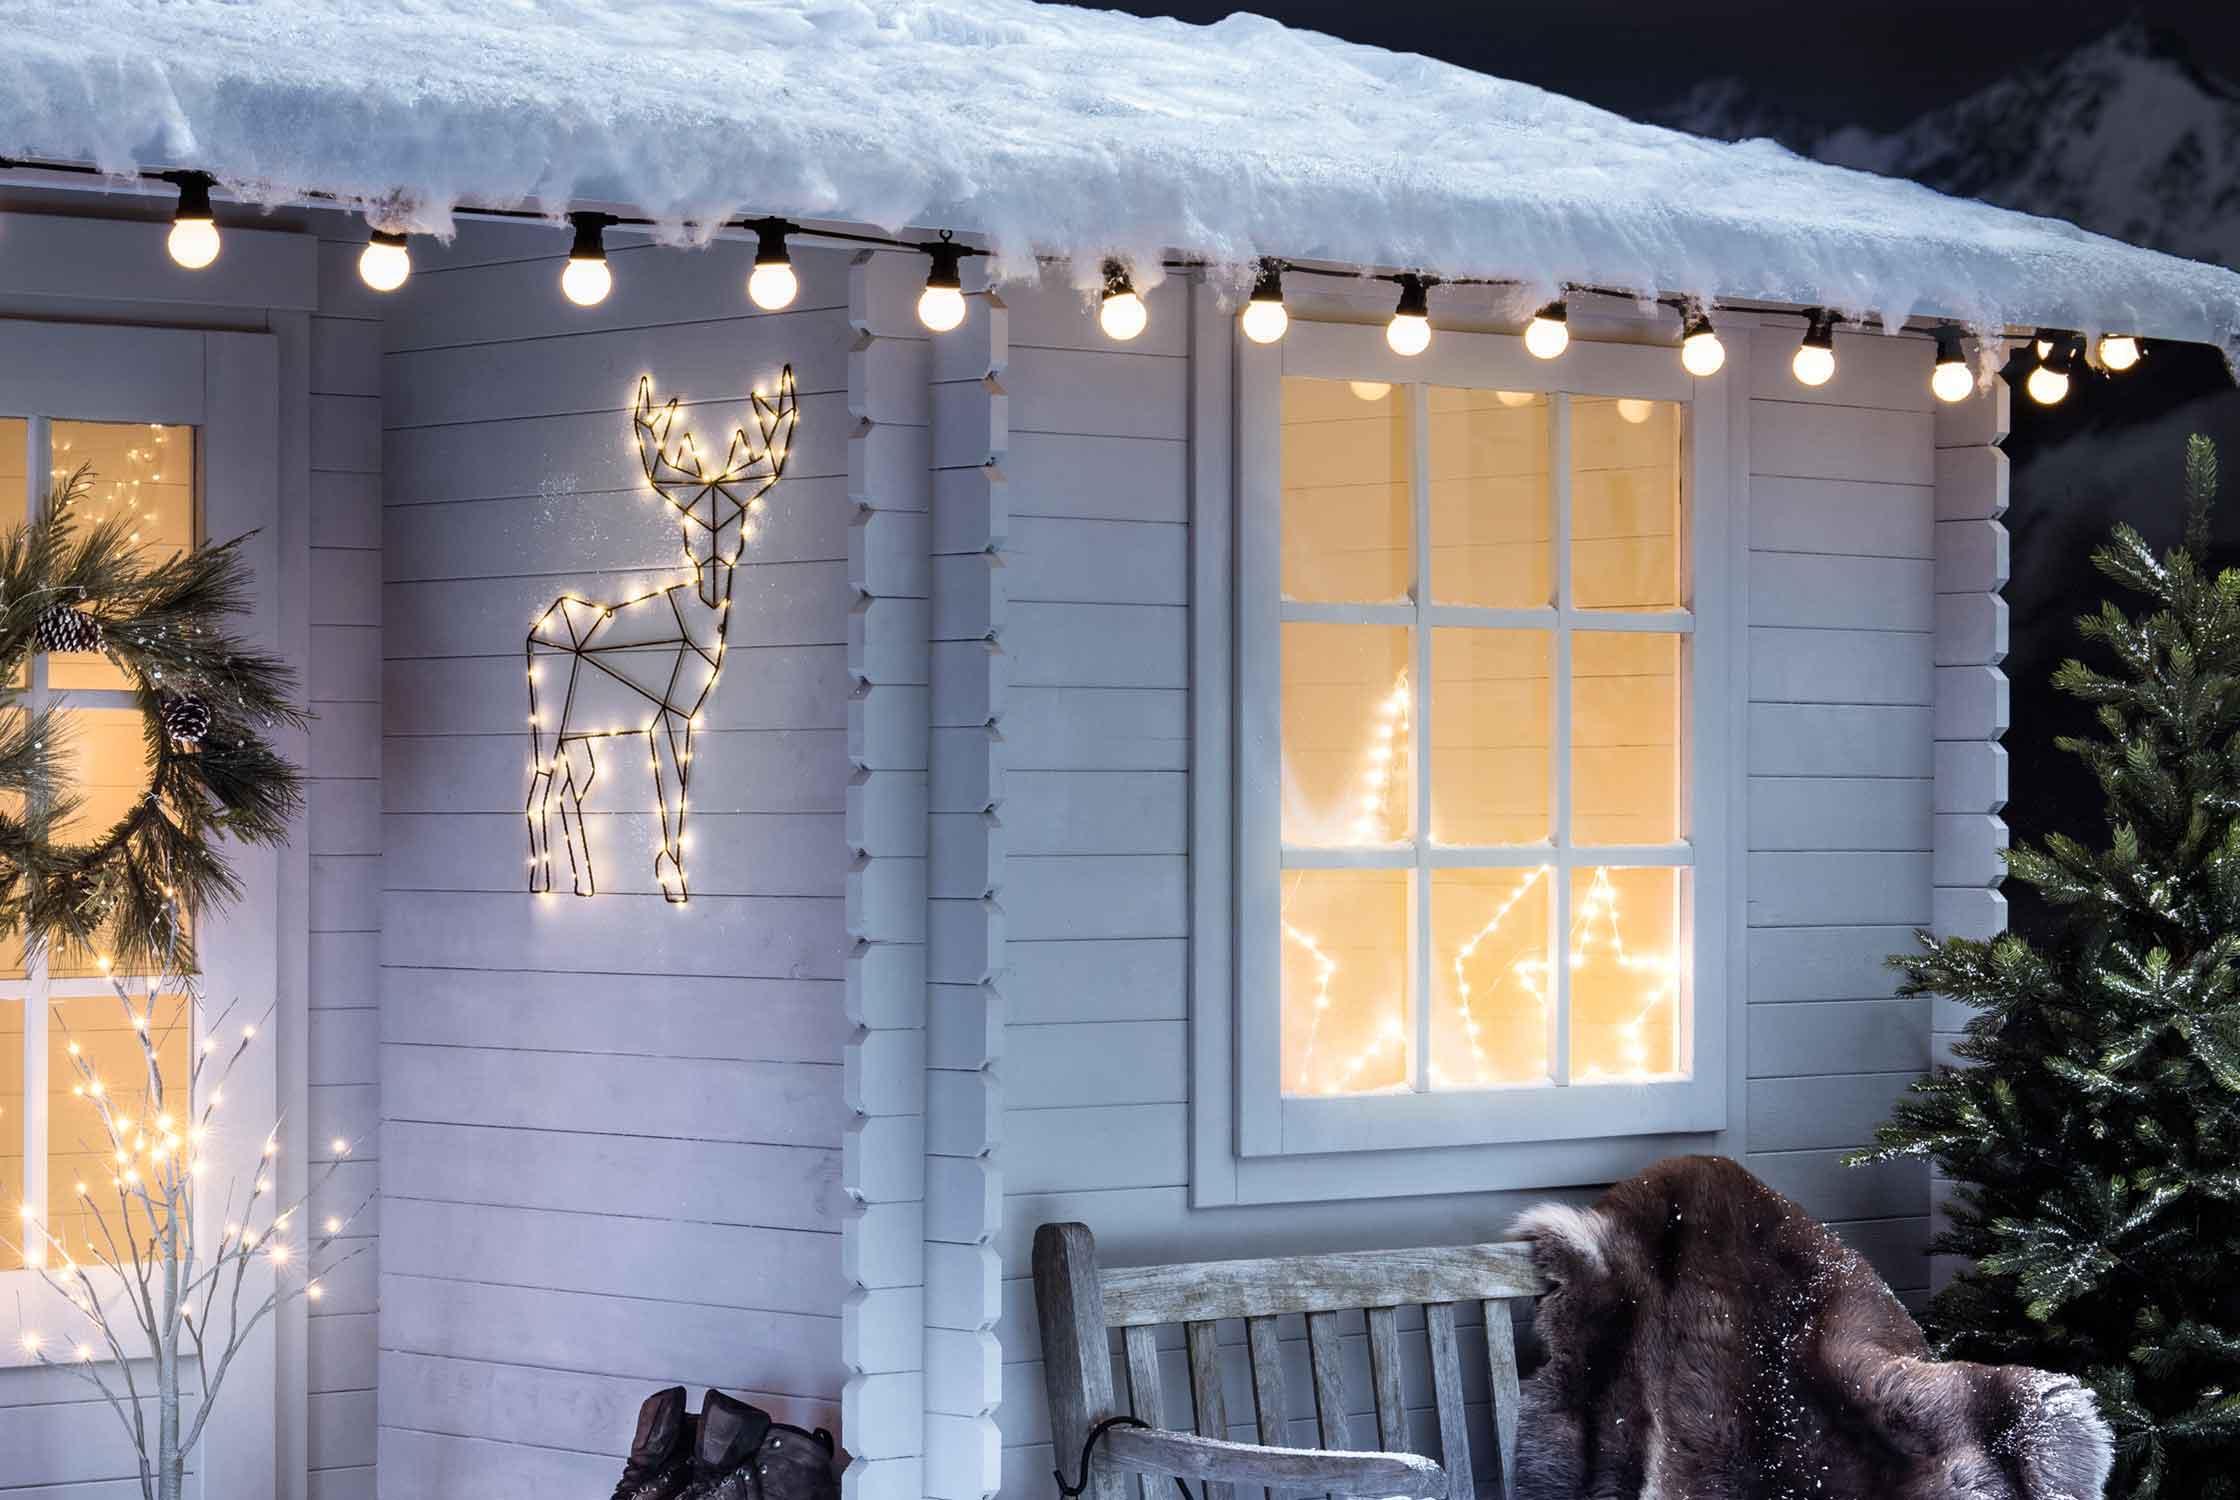 Fenster Weihnachtsbeleuchtung.Ideen Zur Weihnachtsbeleuchtung Im Fenster Lights4fun De